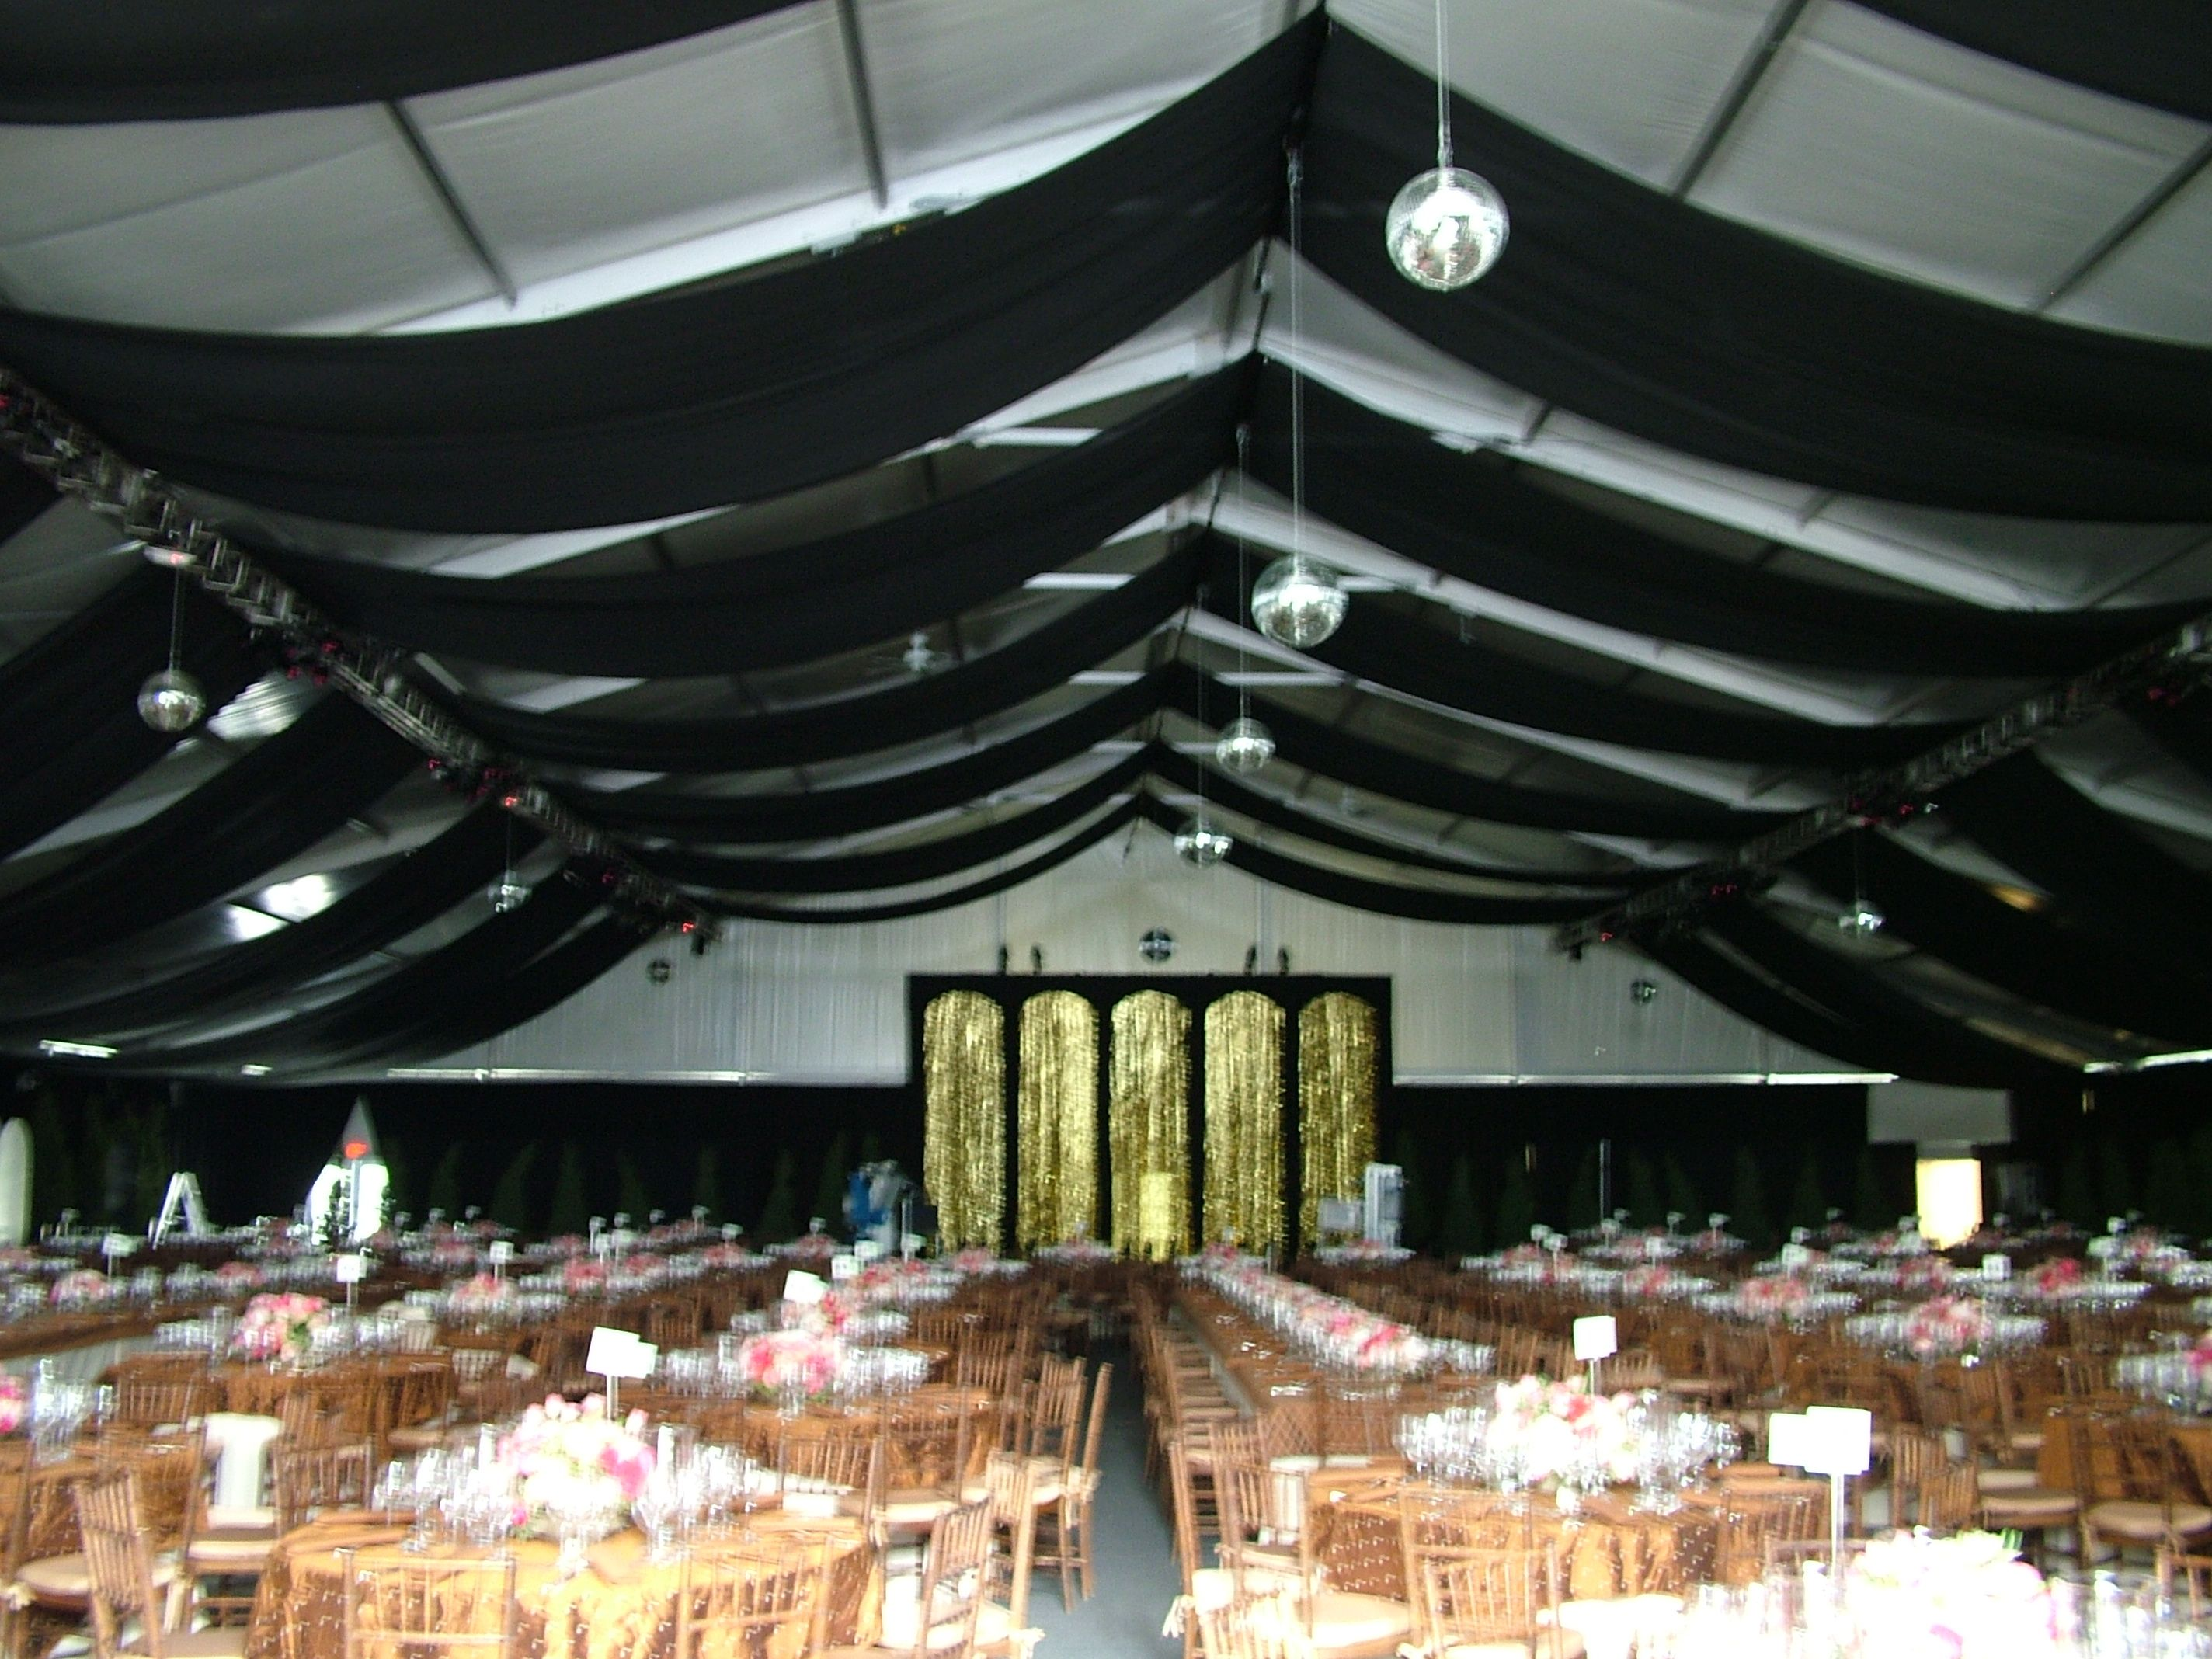 Black Ceiling treatment for a venue | Kemaya's Quinceanera ...